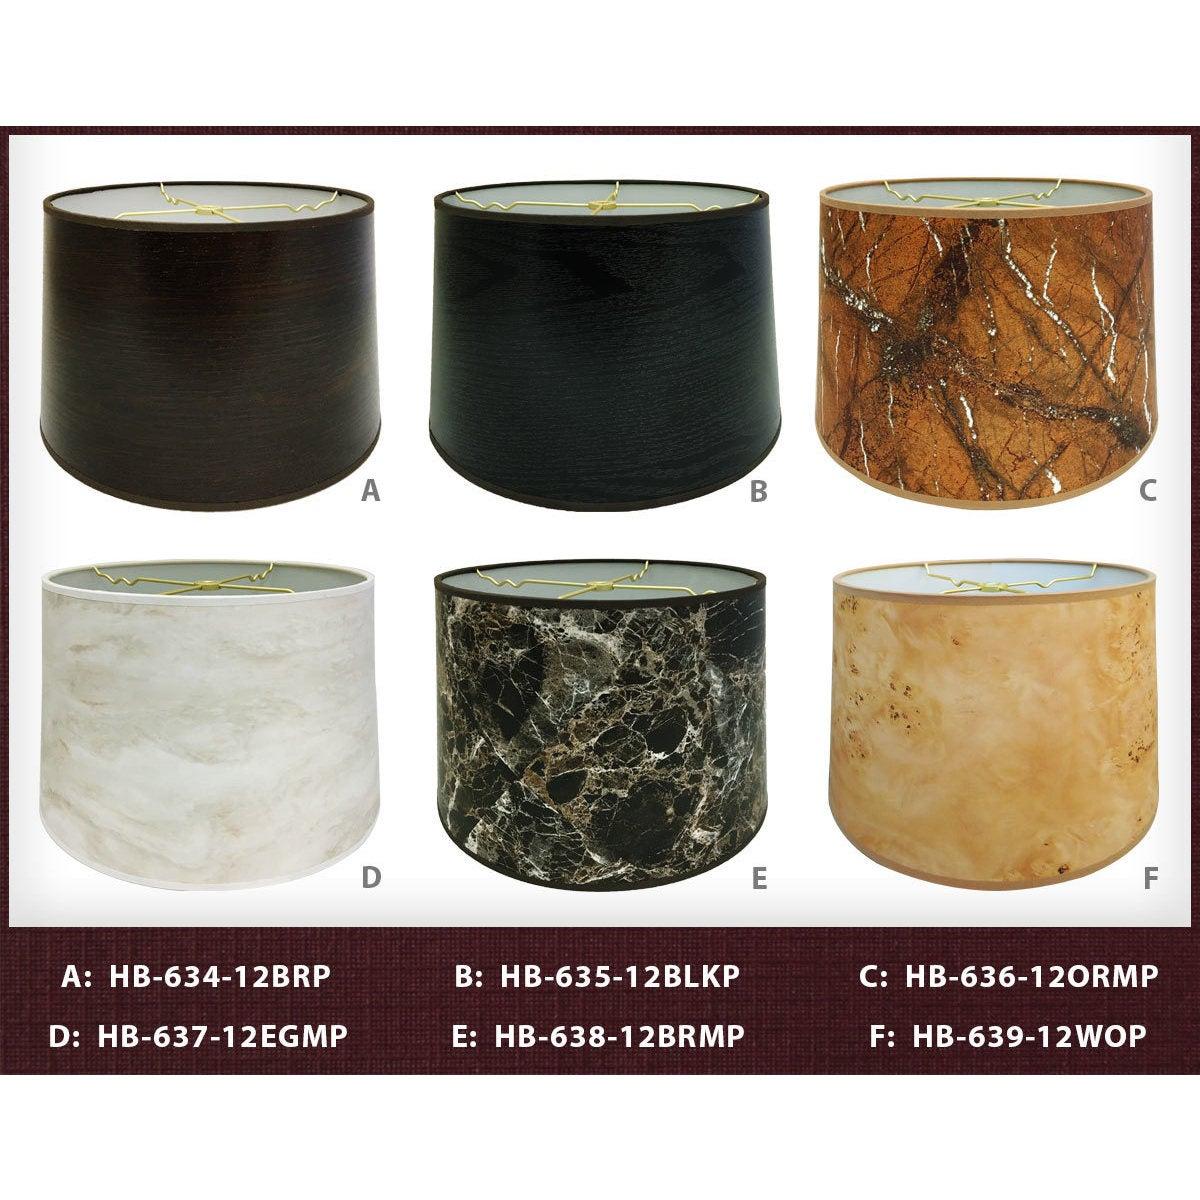 Royal Designs Linen Eggshell And Black Vintage French Print Hardback Lamp Shade Overstock 20192252 17 X 18 X 11 5